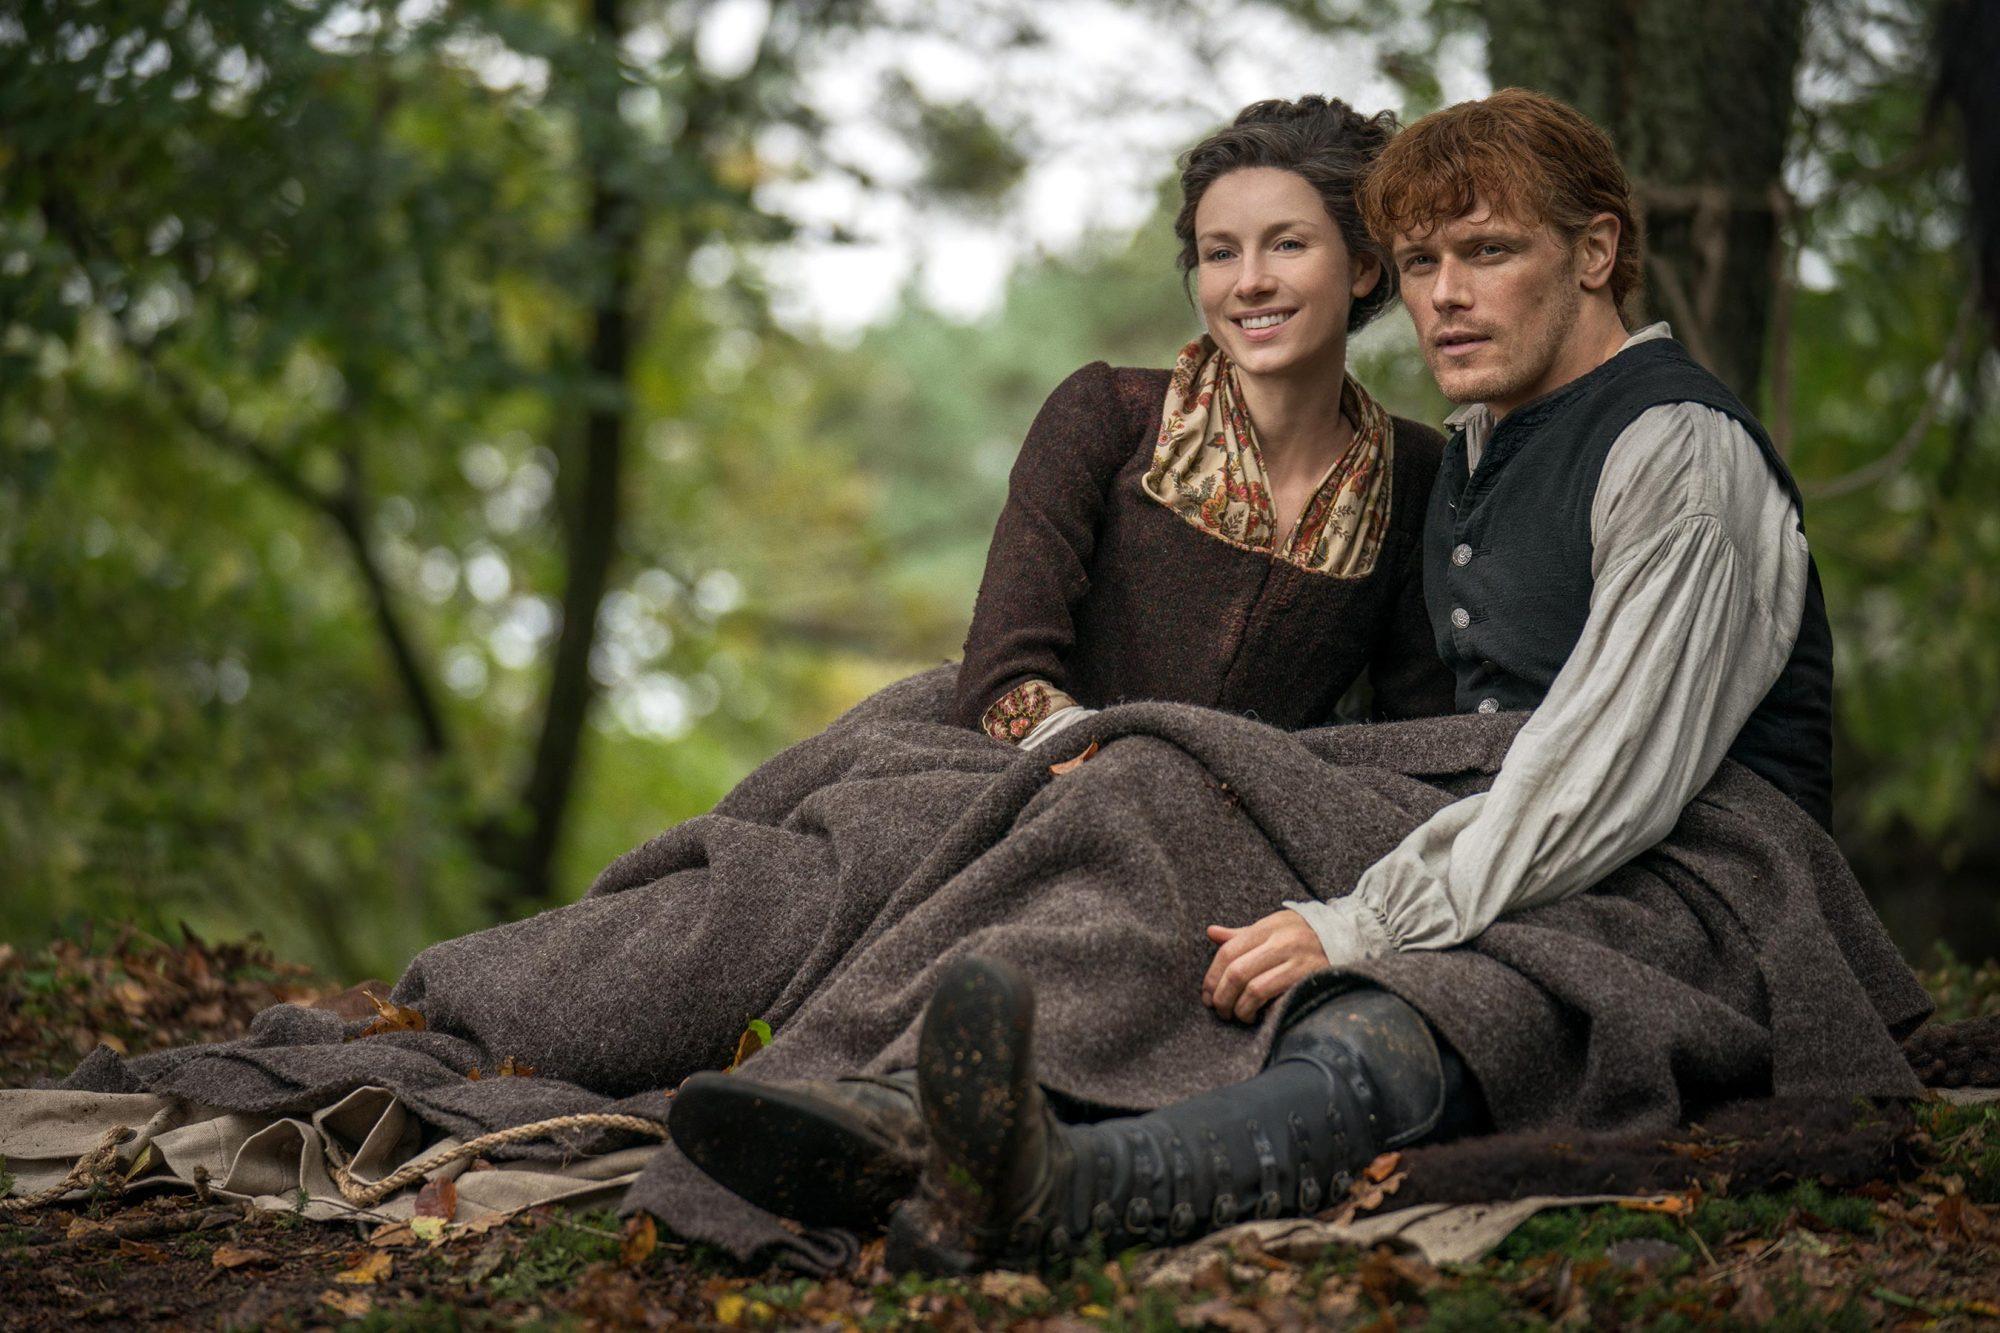 Outlander Season 4 Caitriona Balfe (Claire Randall Fraser), Sam Heughan (Jamie Fraser) Credit: Aimee Spinks/Starz